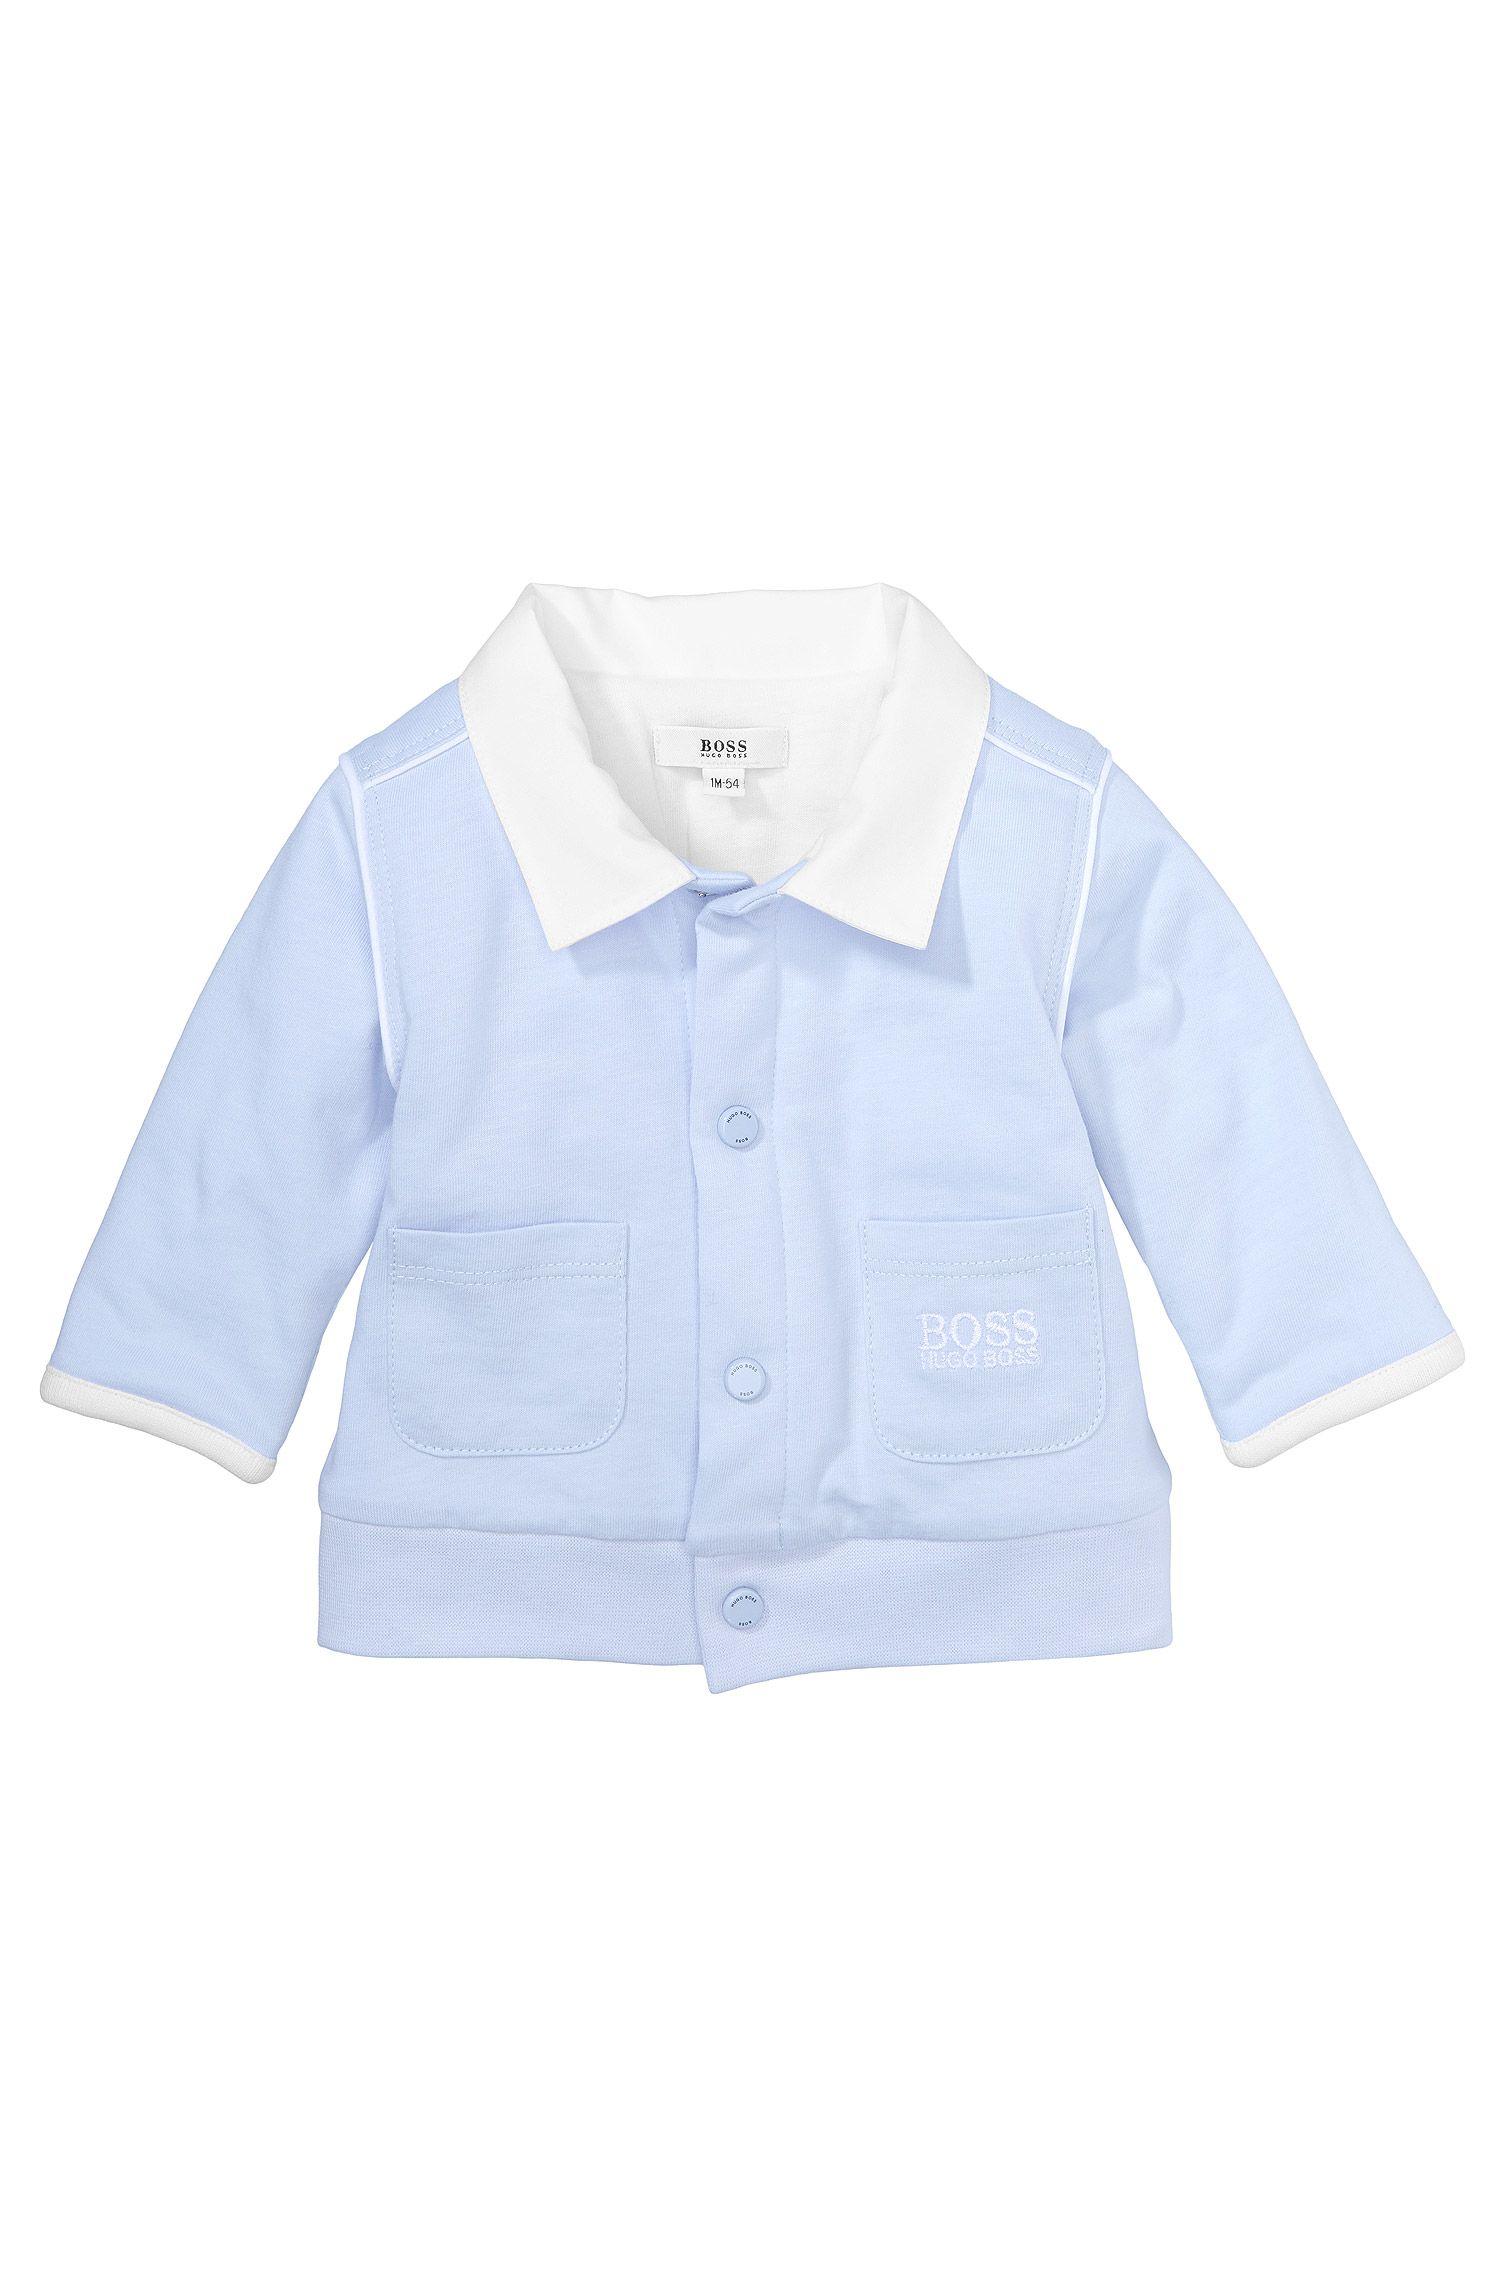 Kids-Sweatshirt-Jacke ´J95148` aus Baumwolle